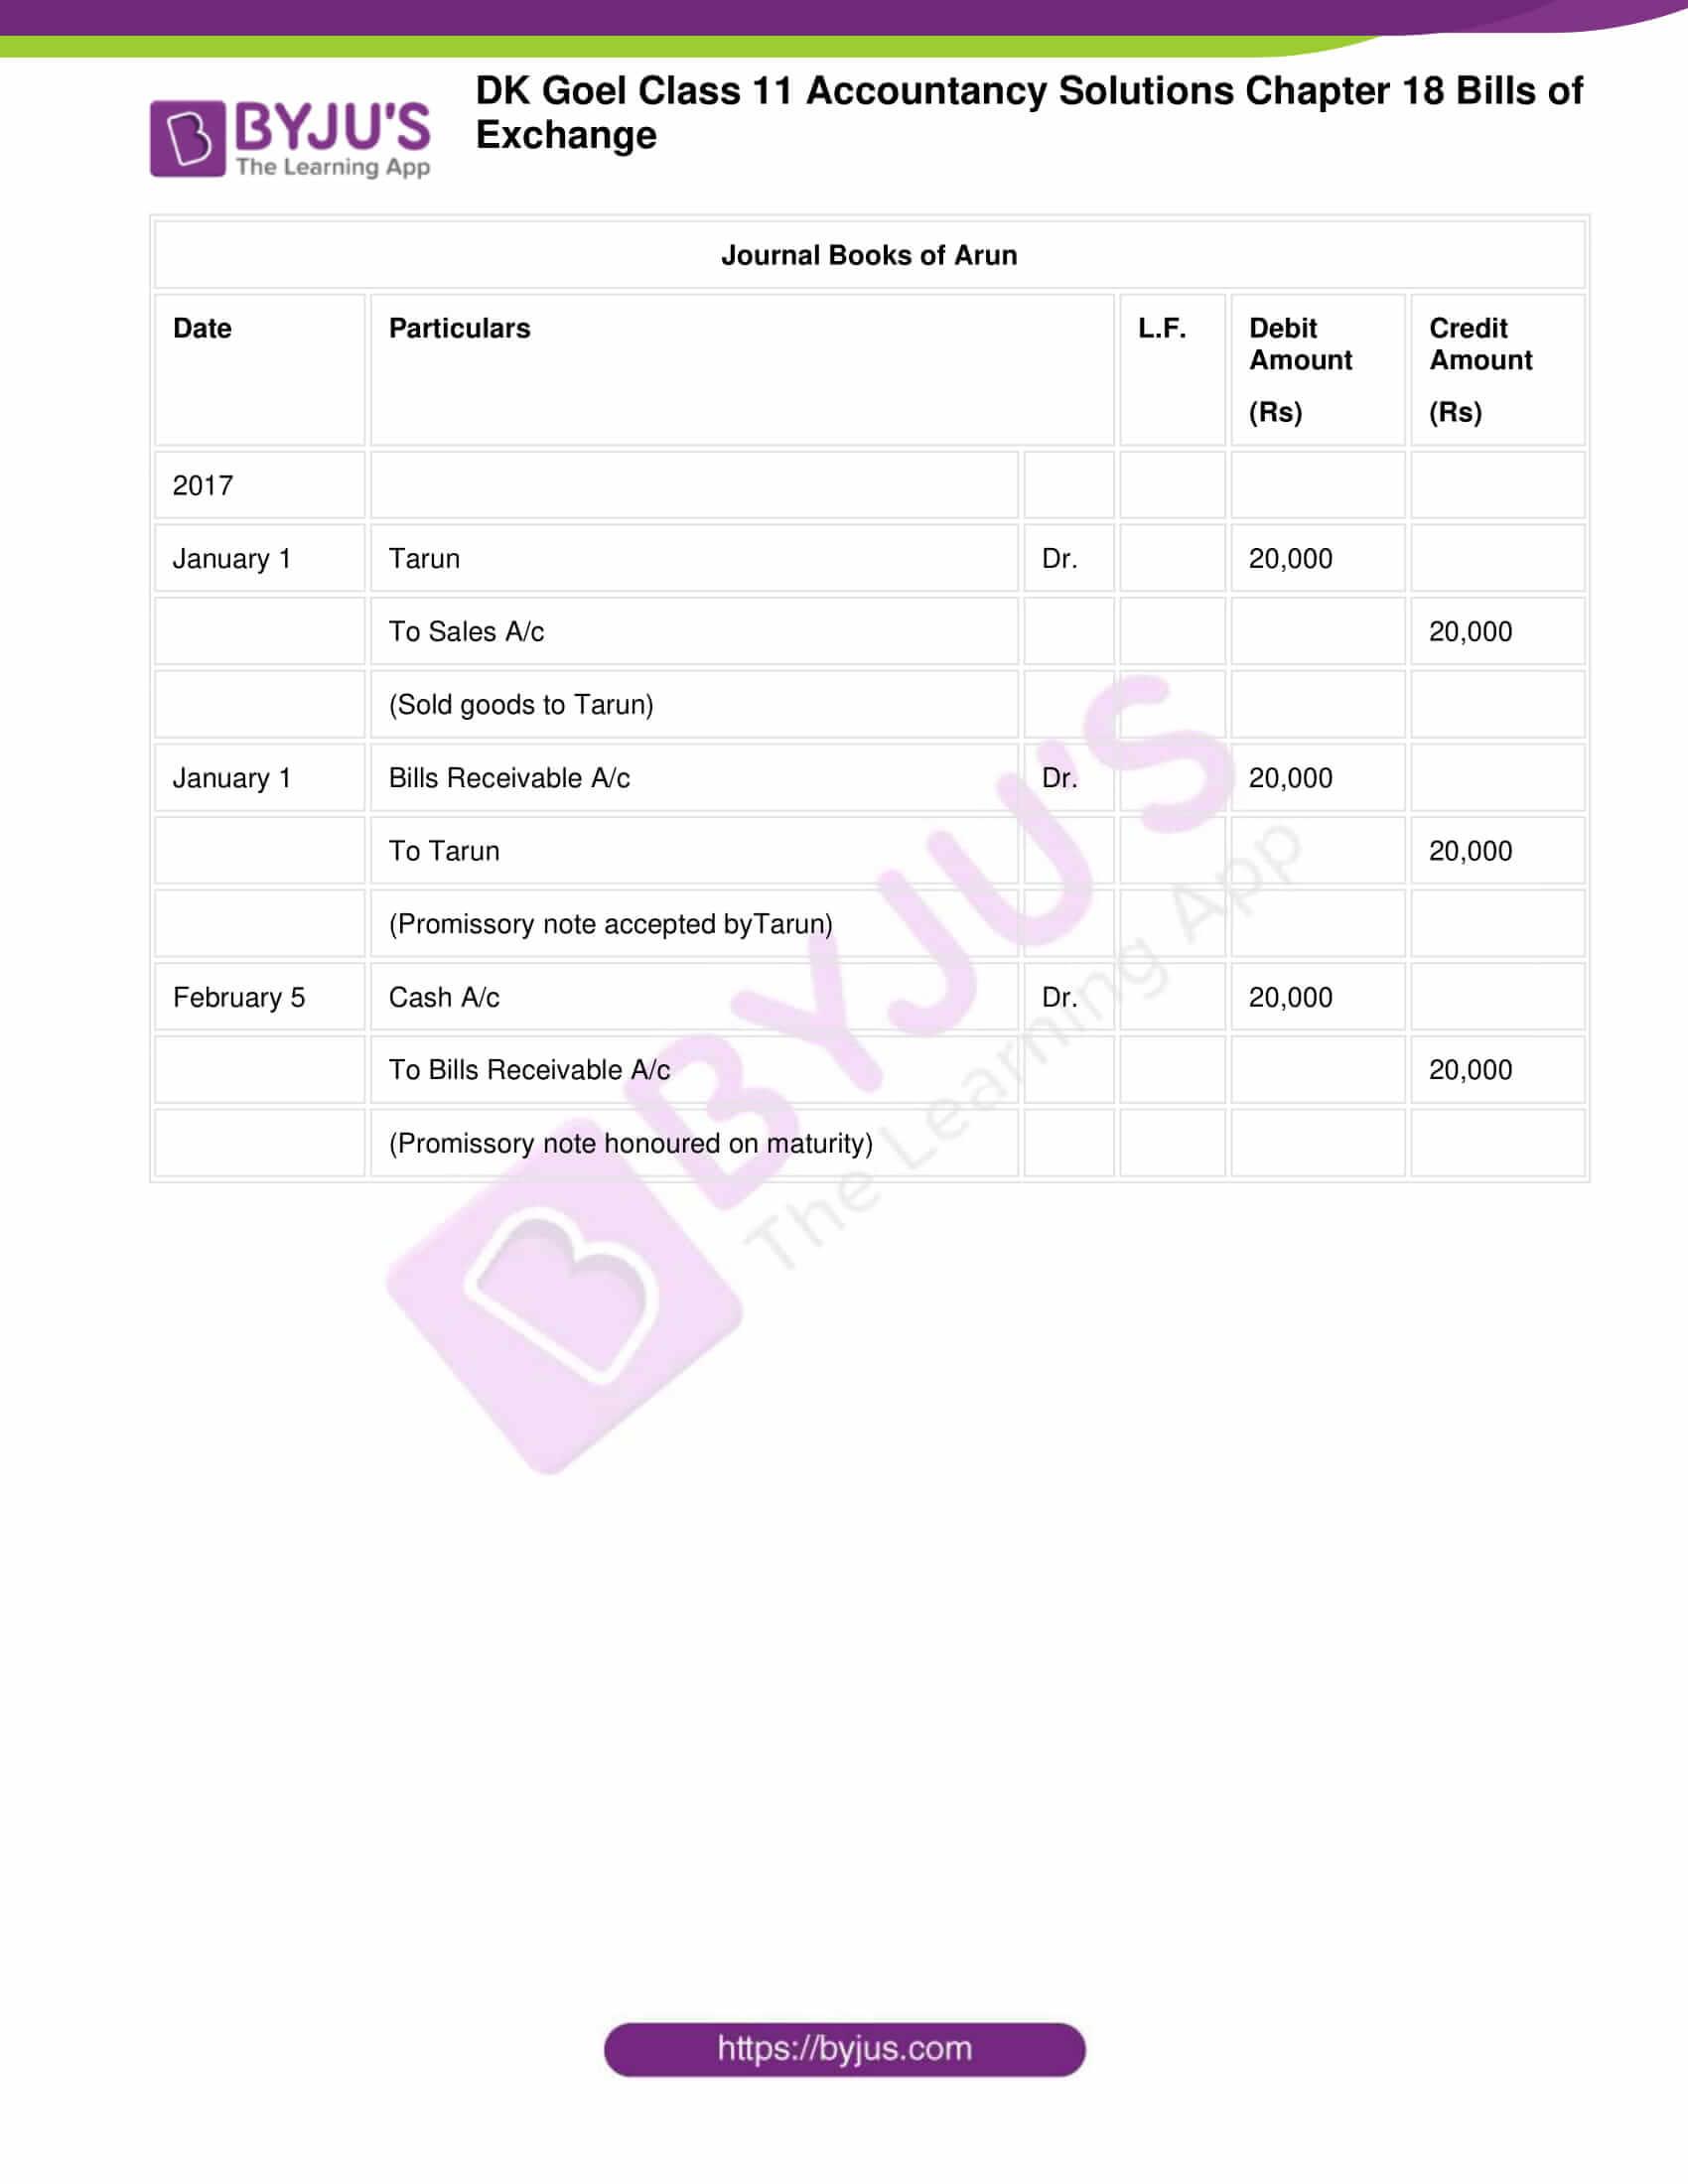 dk goel class 11 accountancy solutions chapter 18 005